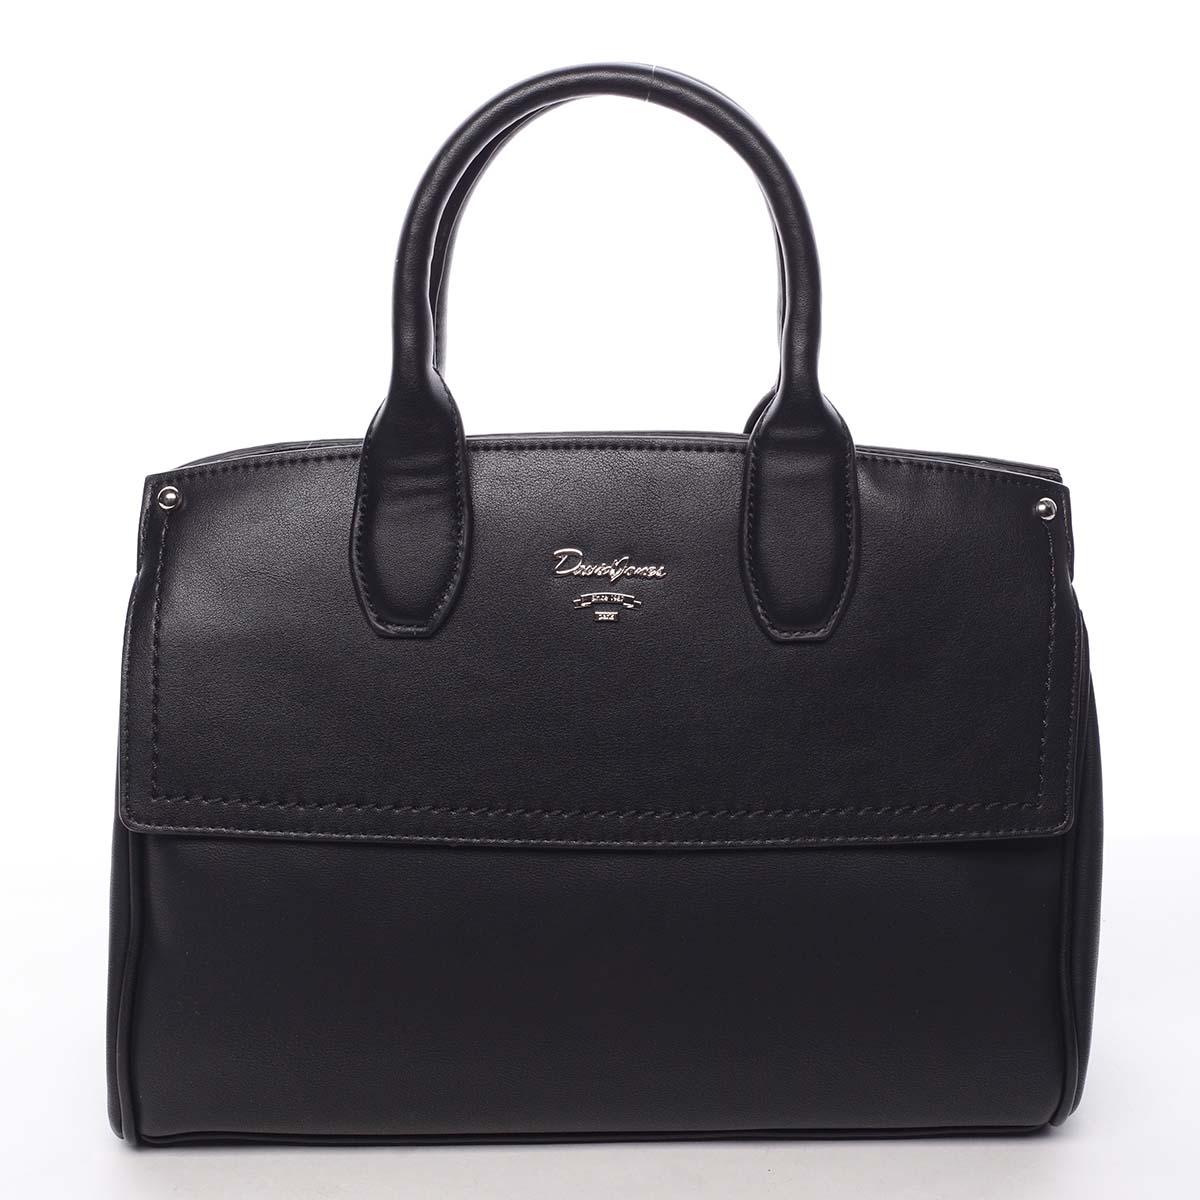 Dámska kabelka do ruky čierna - David Jones Alens čierna